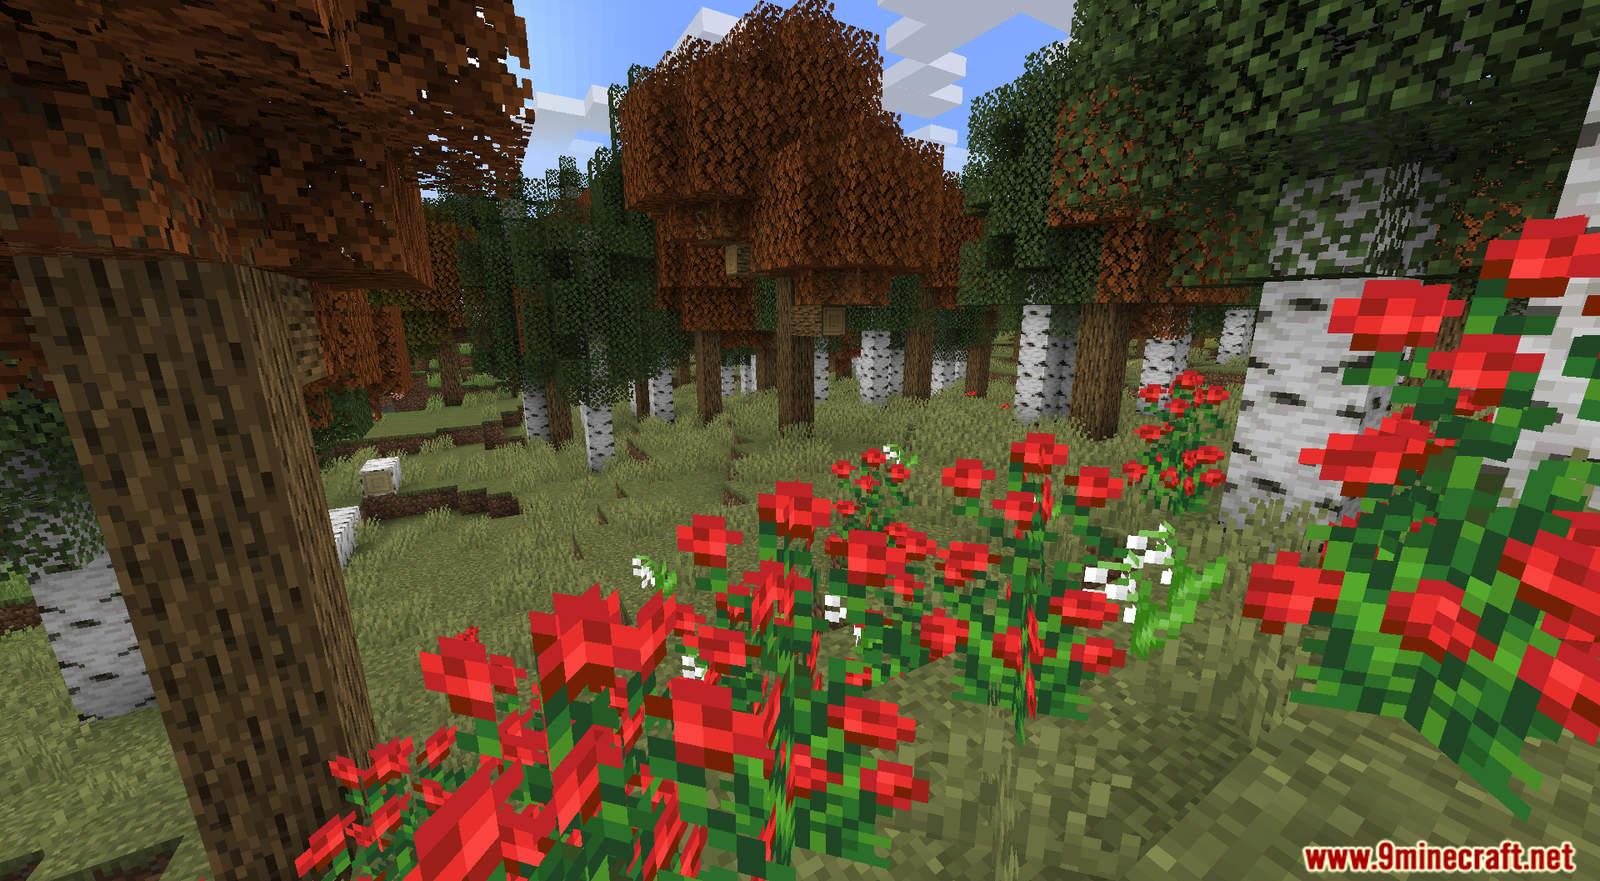 William Wythers' Overhauled Overworld Mod for Minecraft (1)